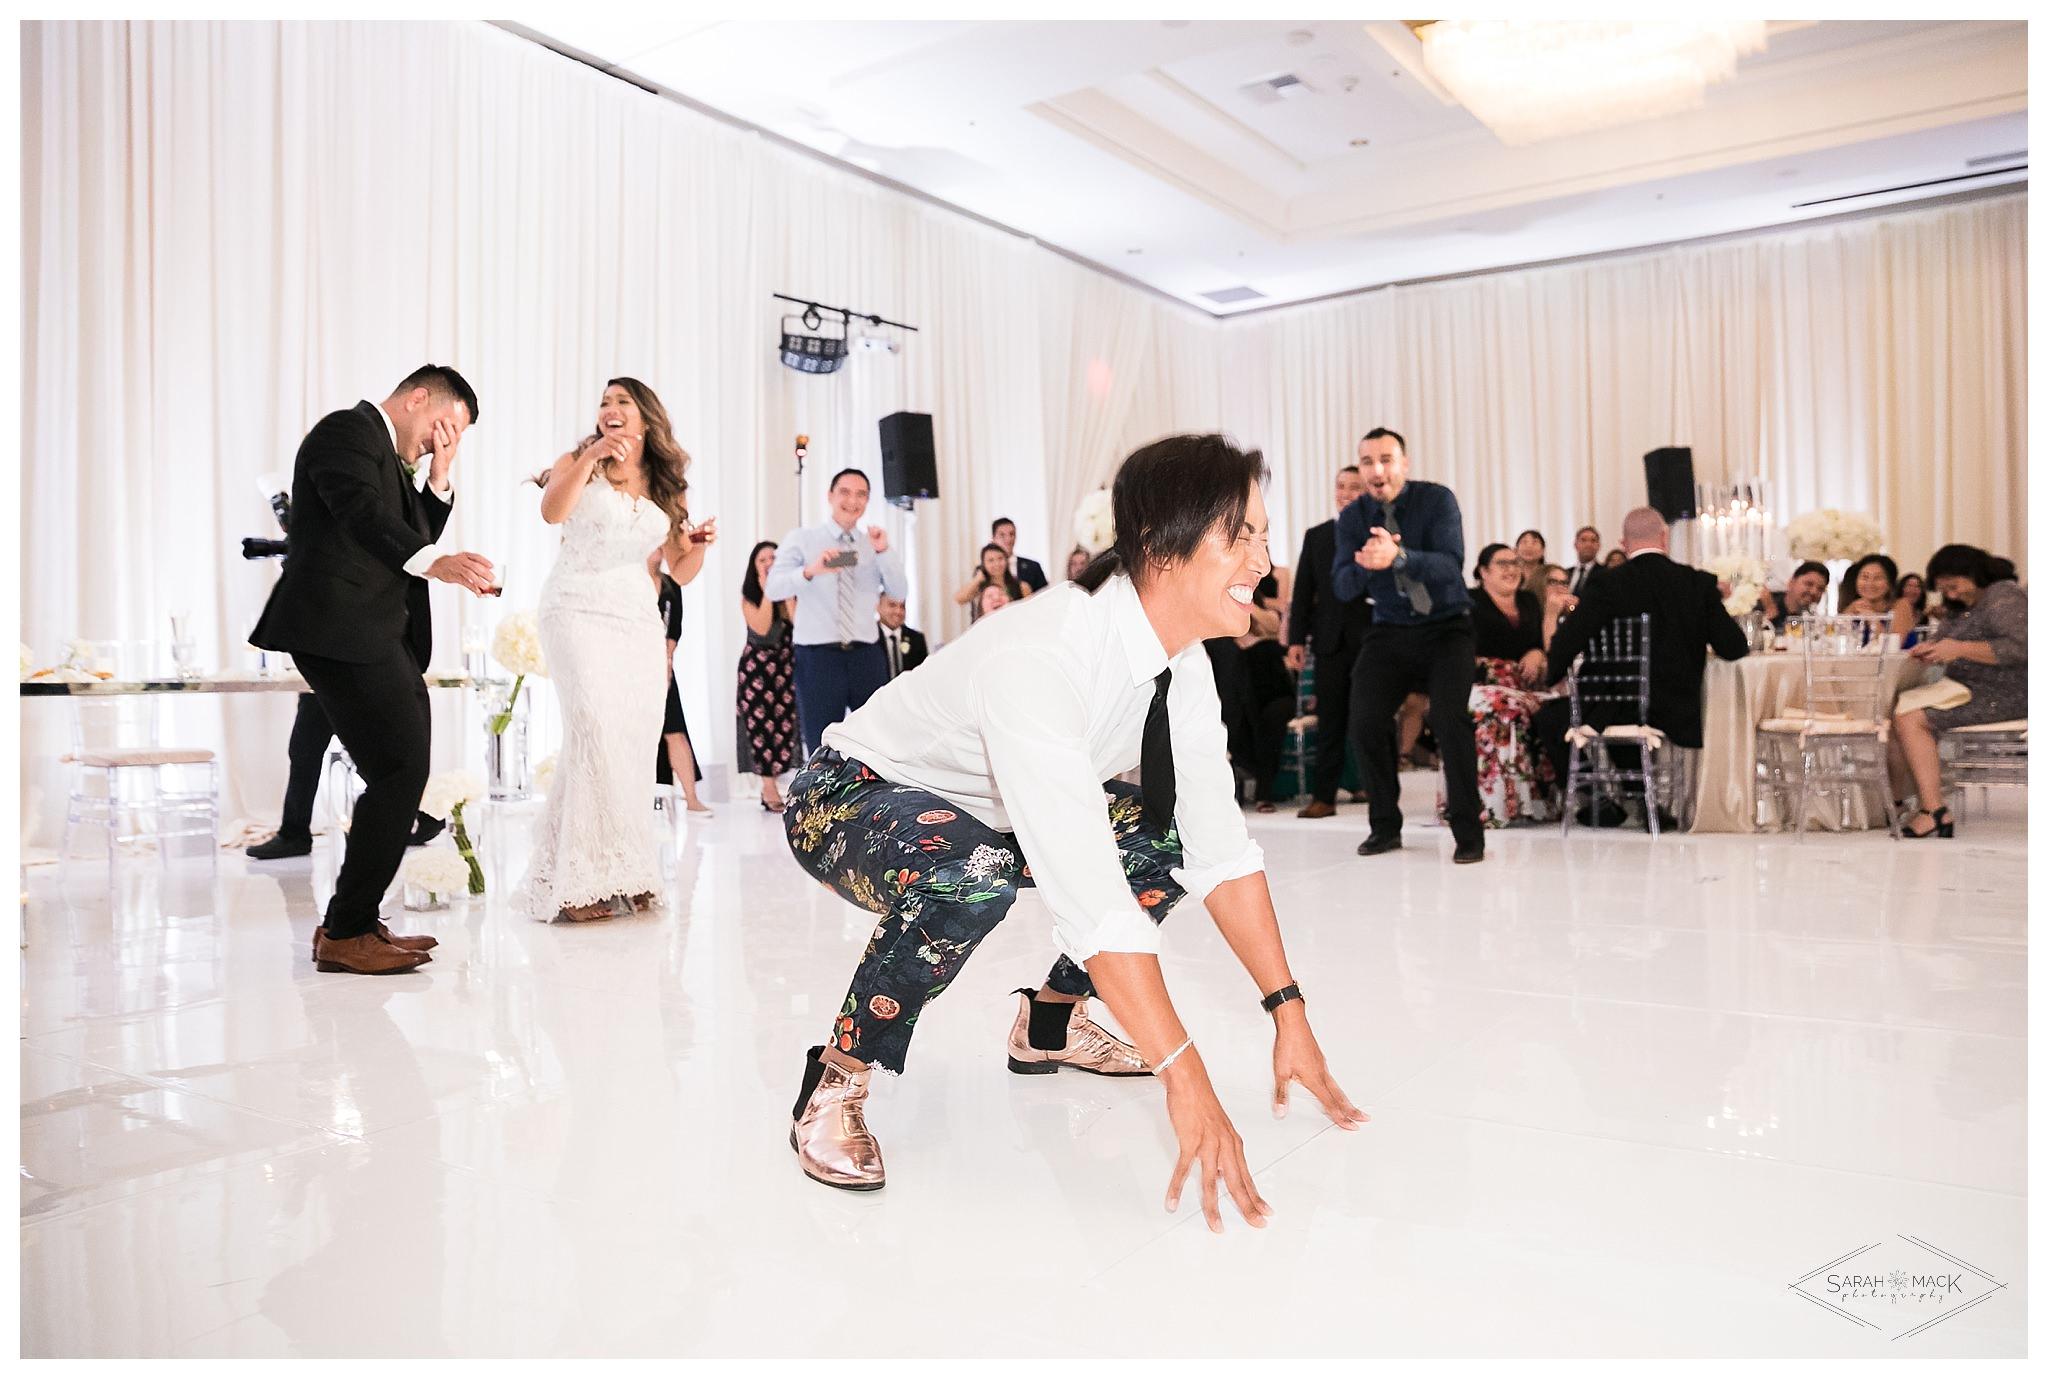 LE-Avenue-of-the-Arts-Costa-Mesa-Wedding-Photography-0212.jpg